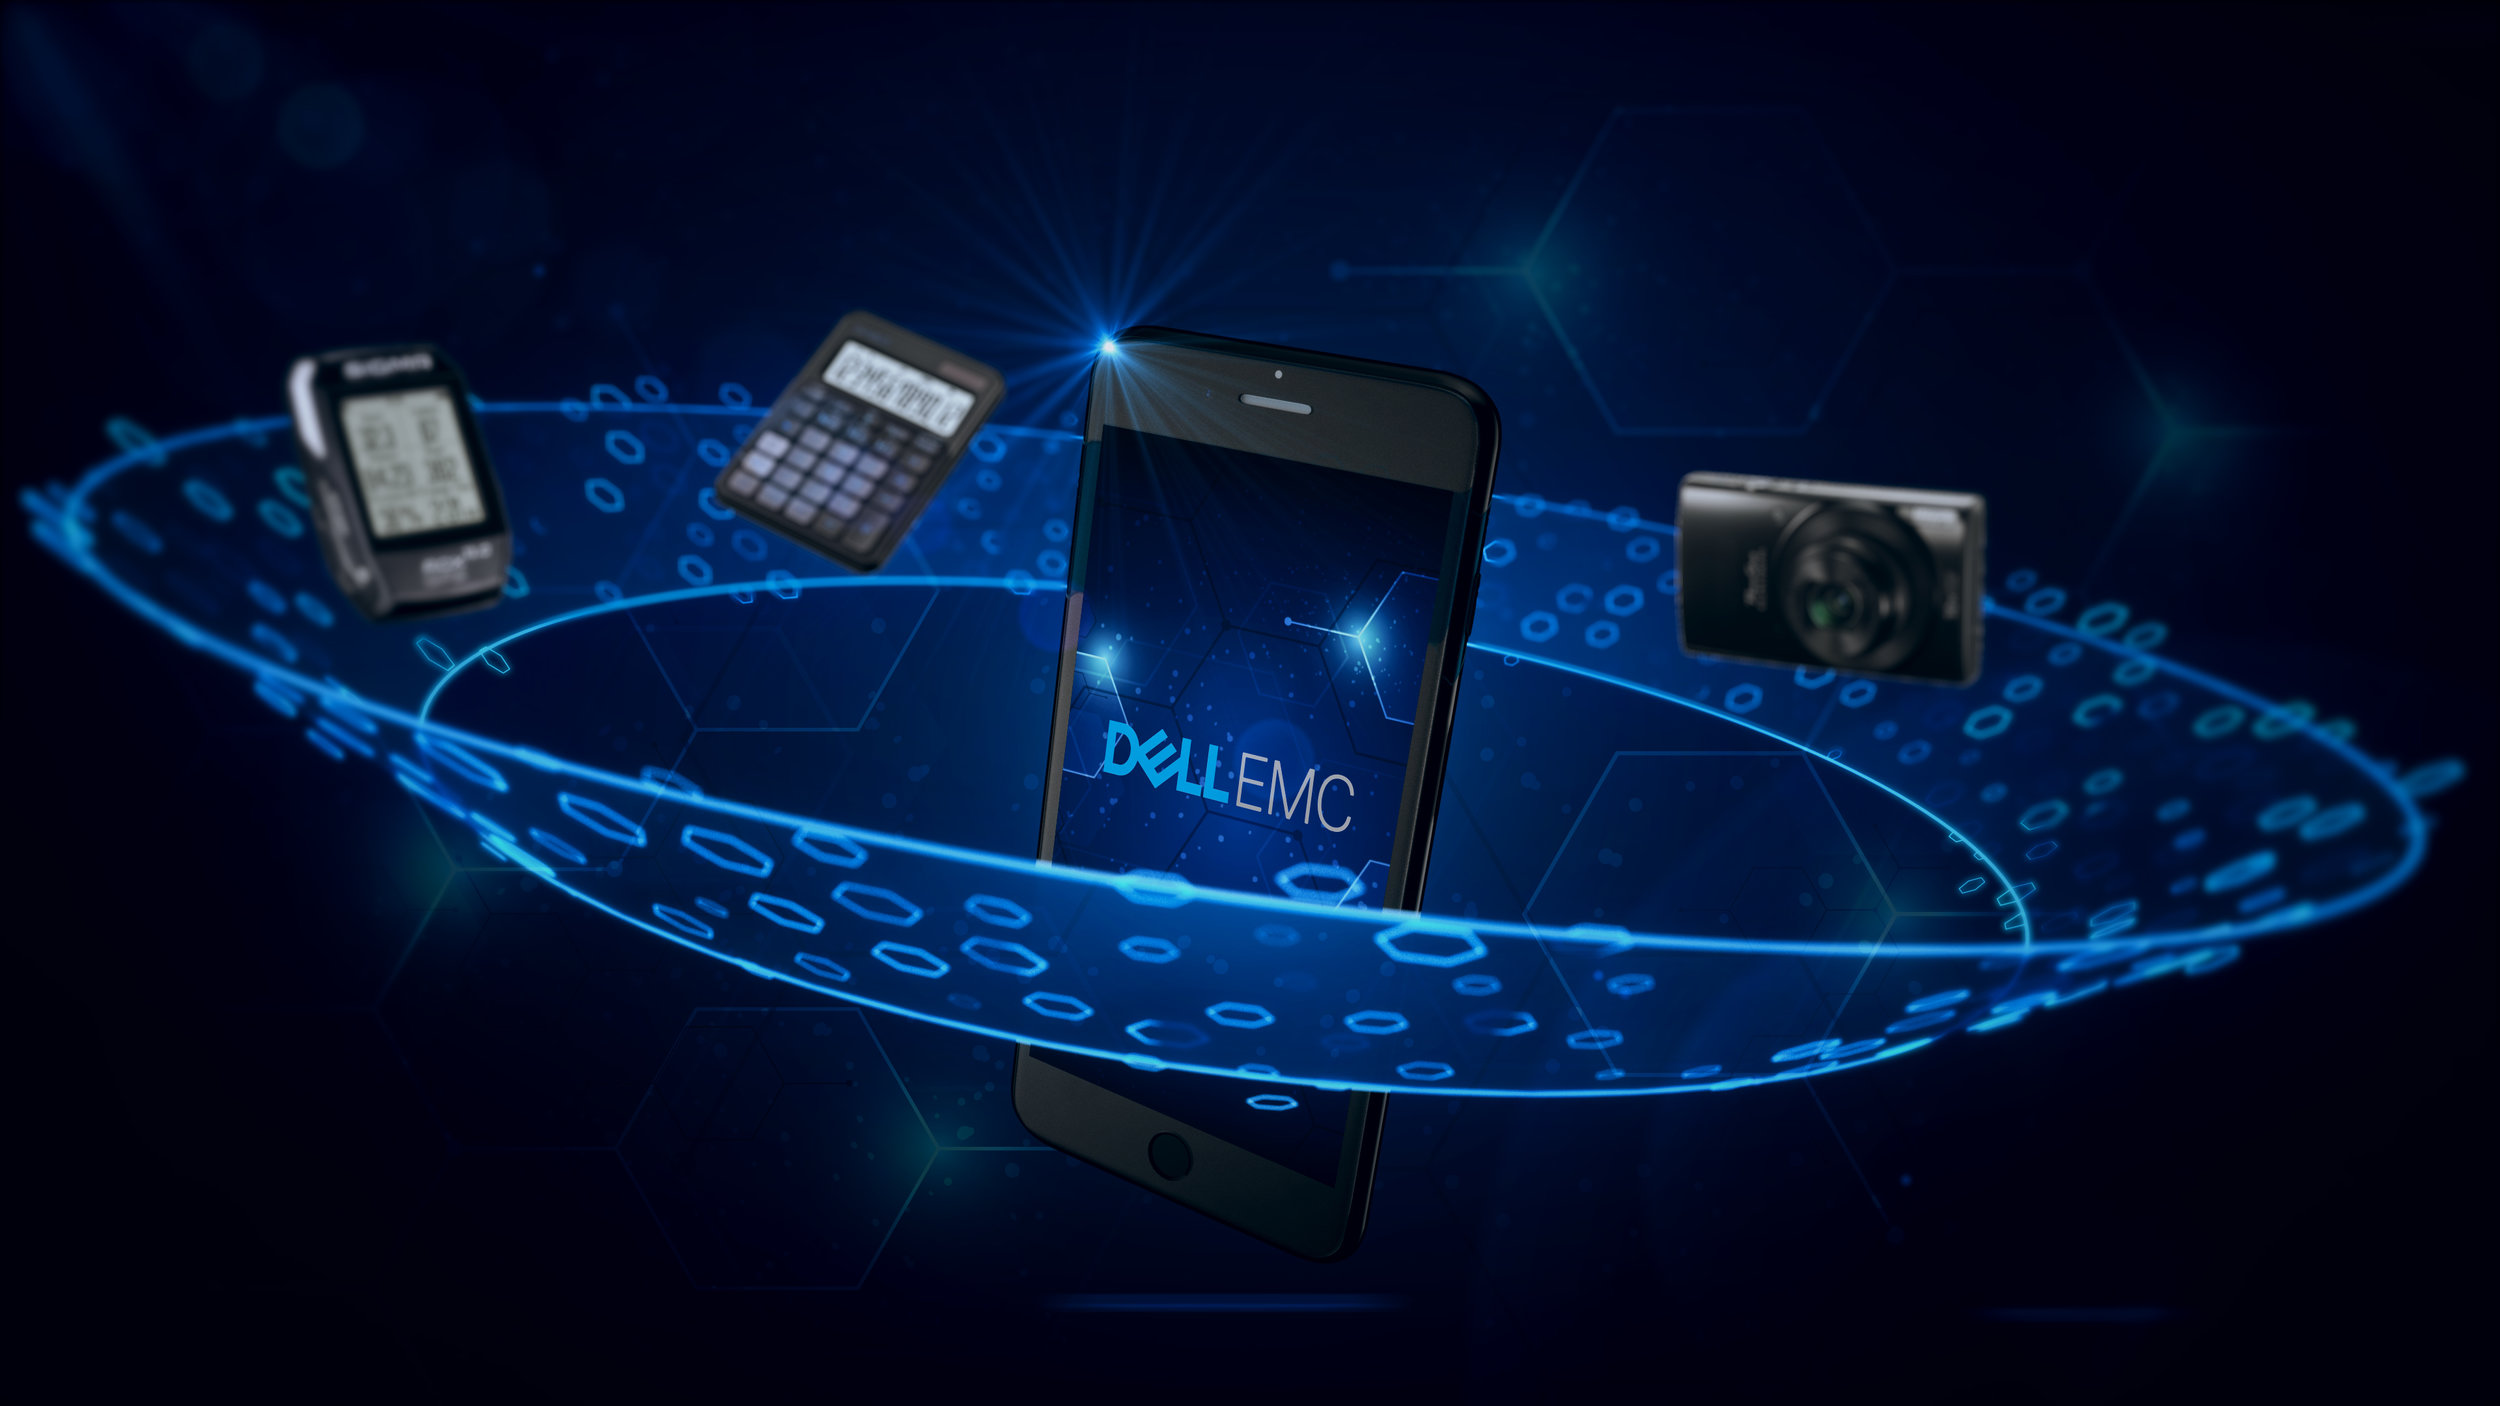 Dell EMC - Smartphone.jpg